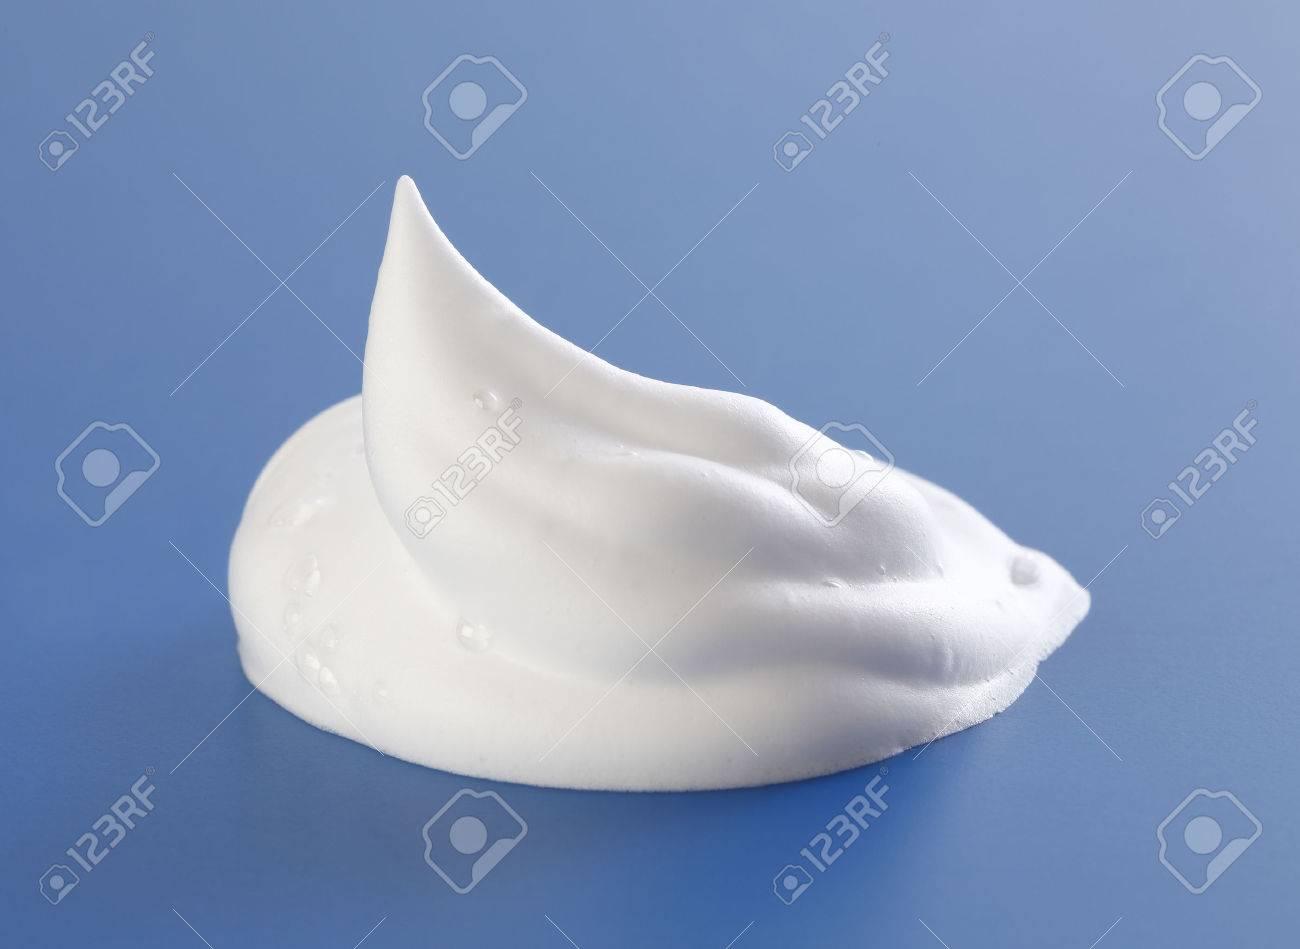 Shaving cream on Blue - 60034346